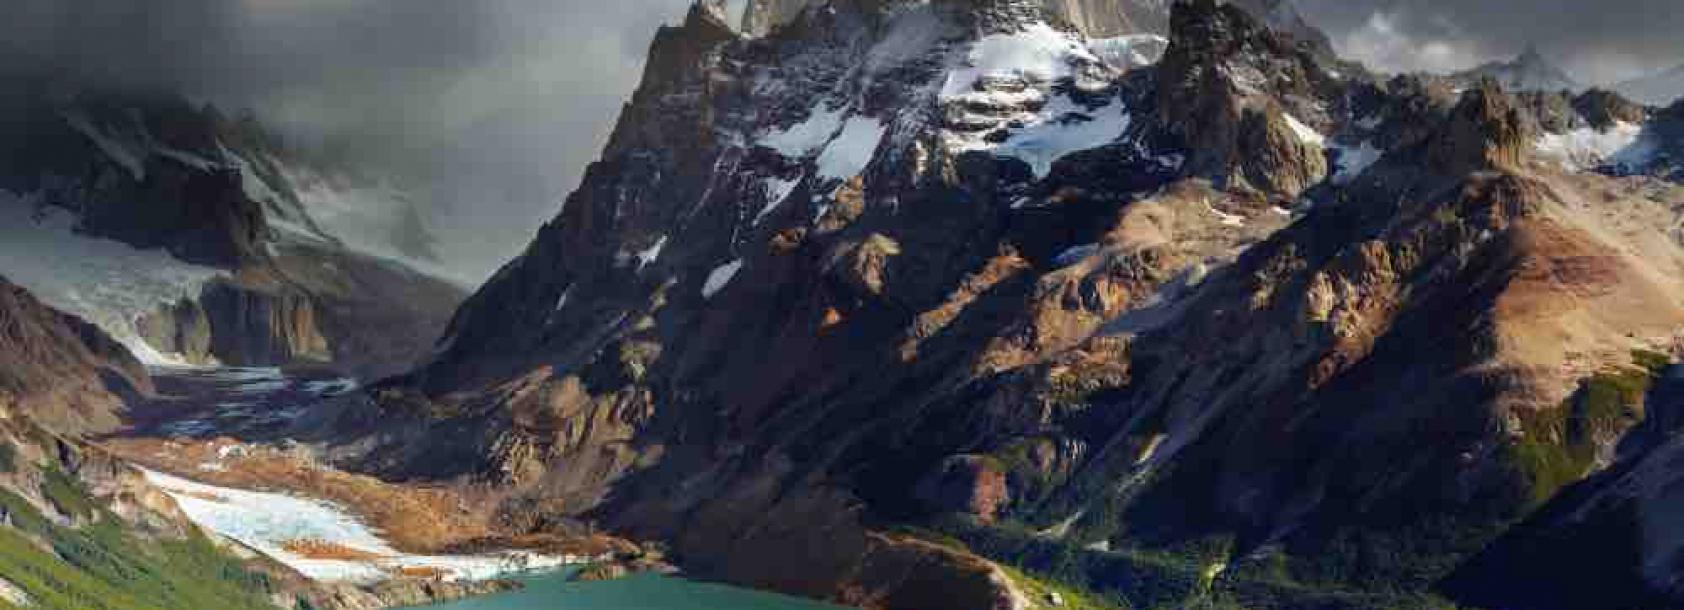 Argentina_Patagonia_Mount Fitz Roy and laguna Torre